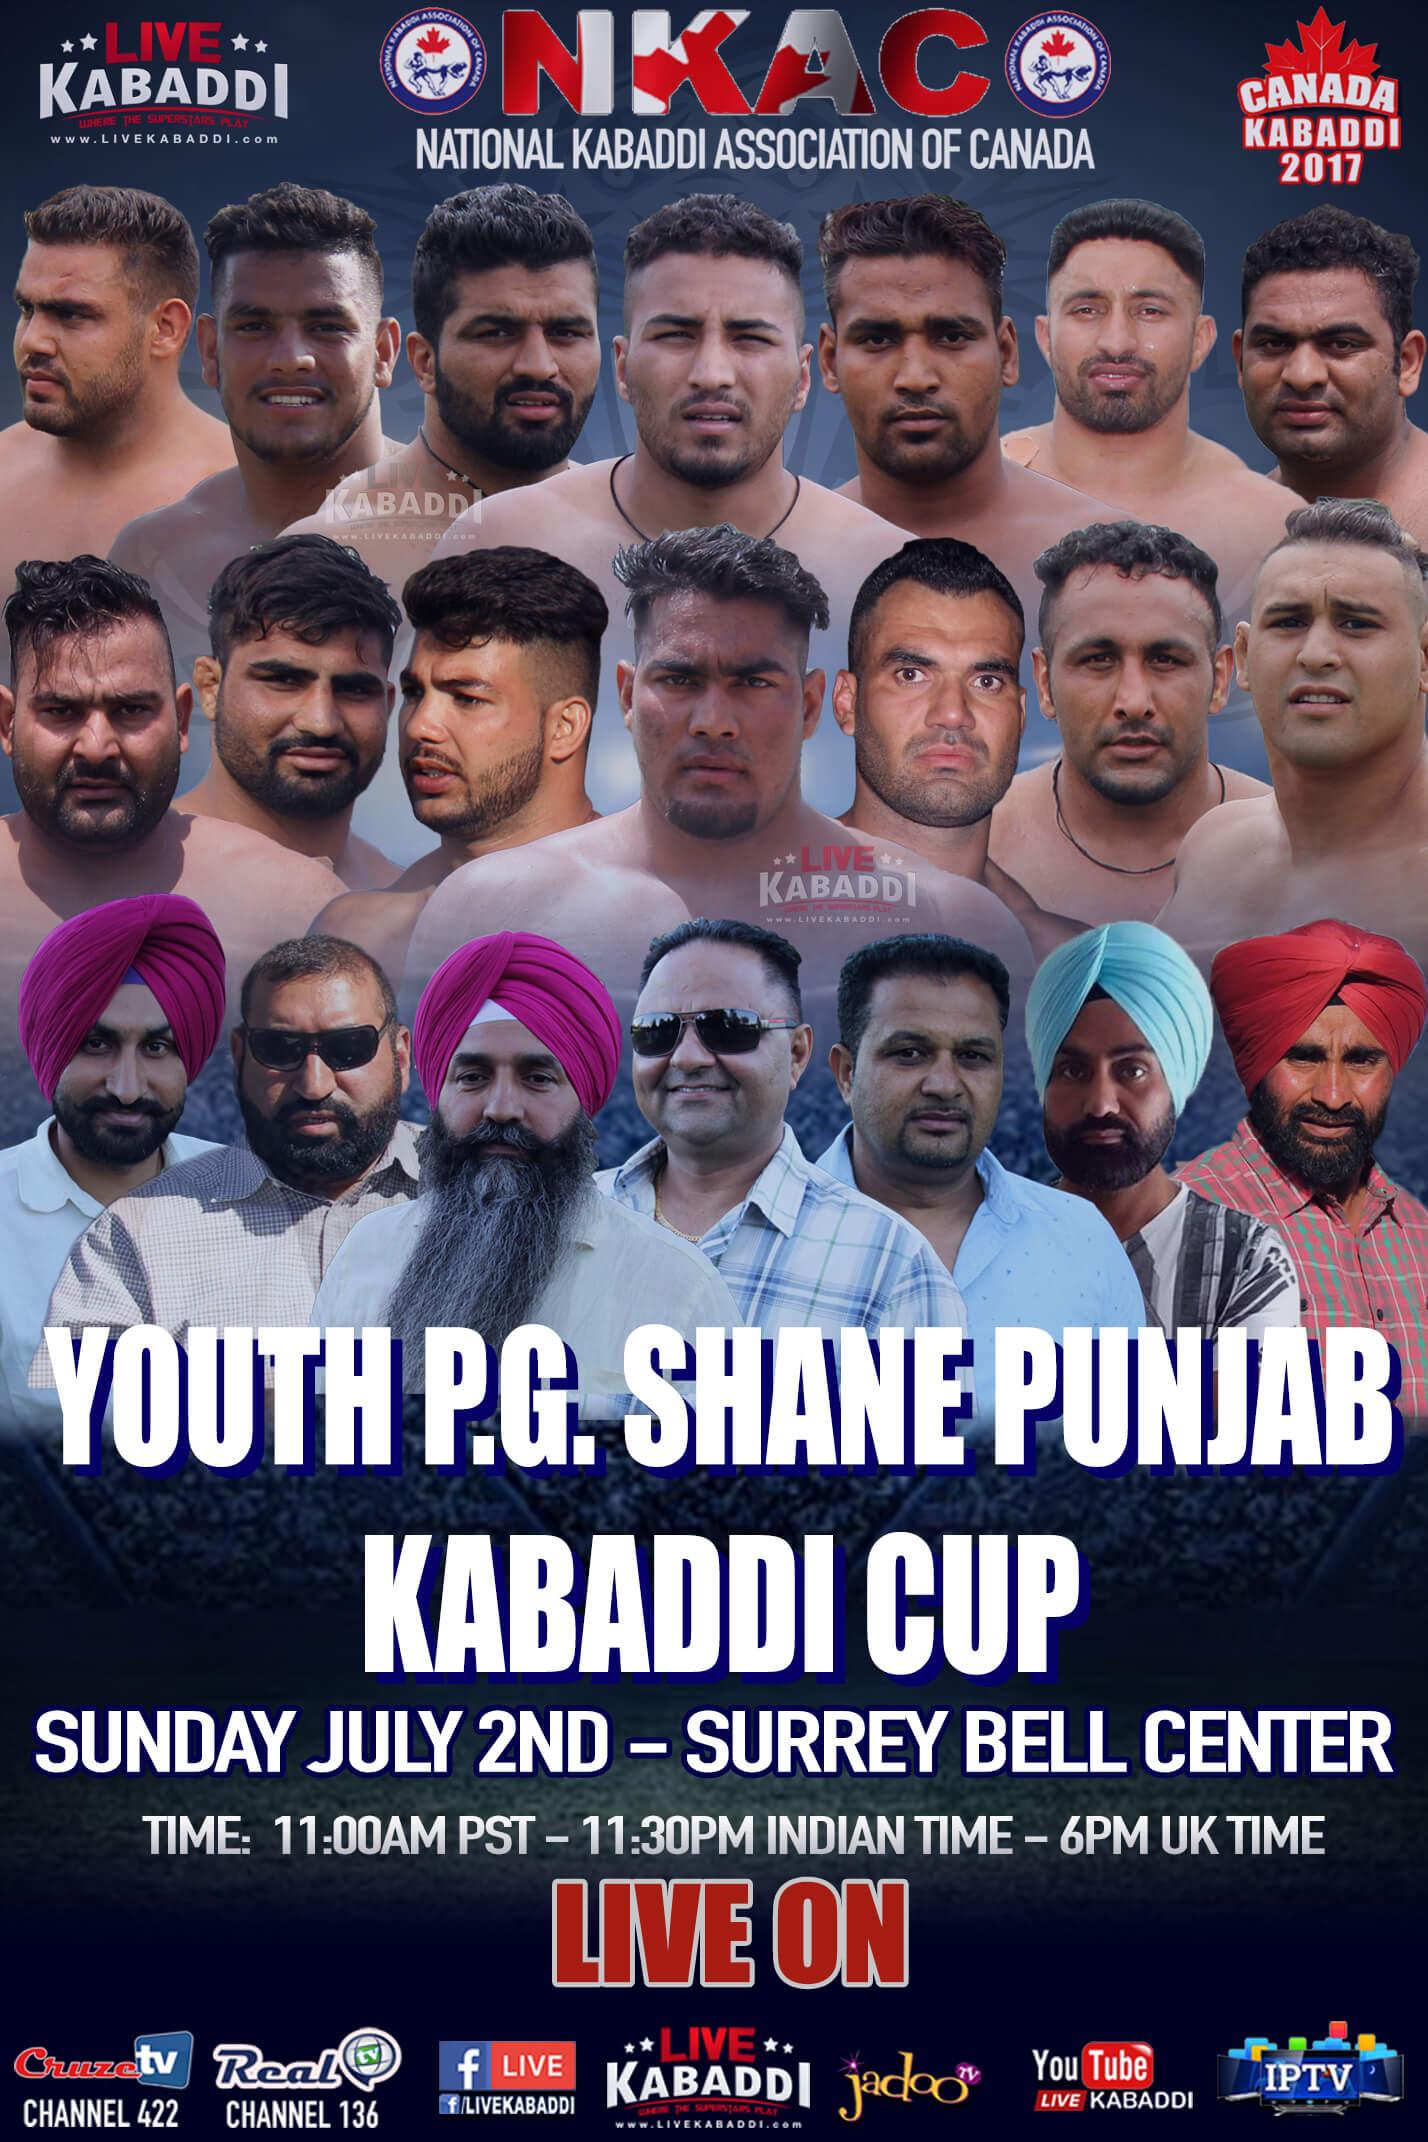 youth-prince-geroge-shane-punjab-kabaddi-cup-2017